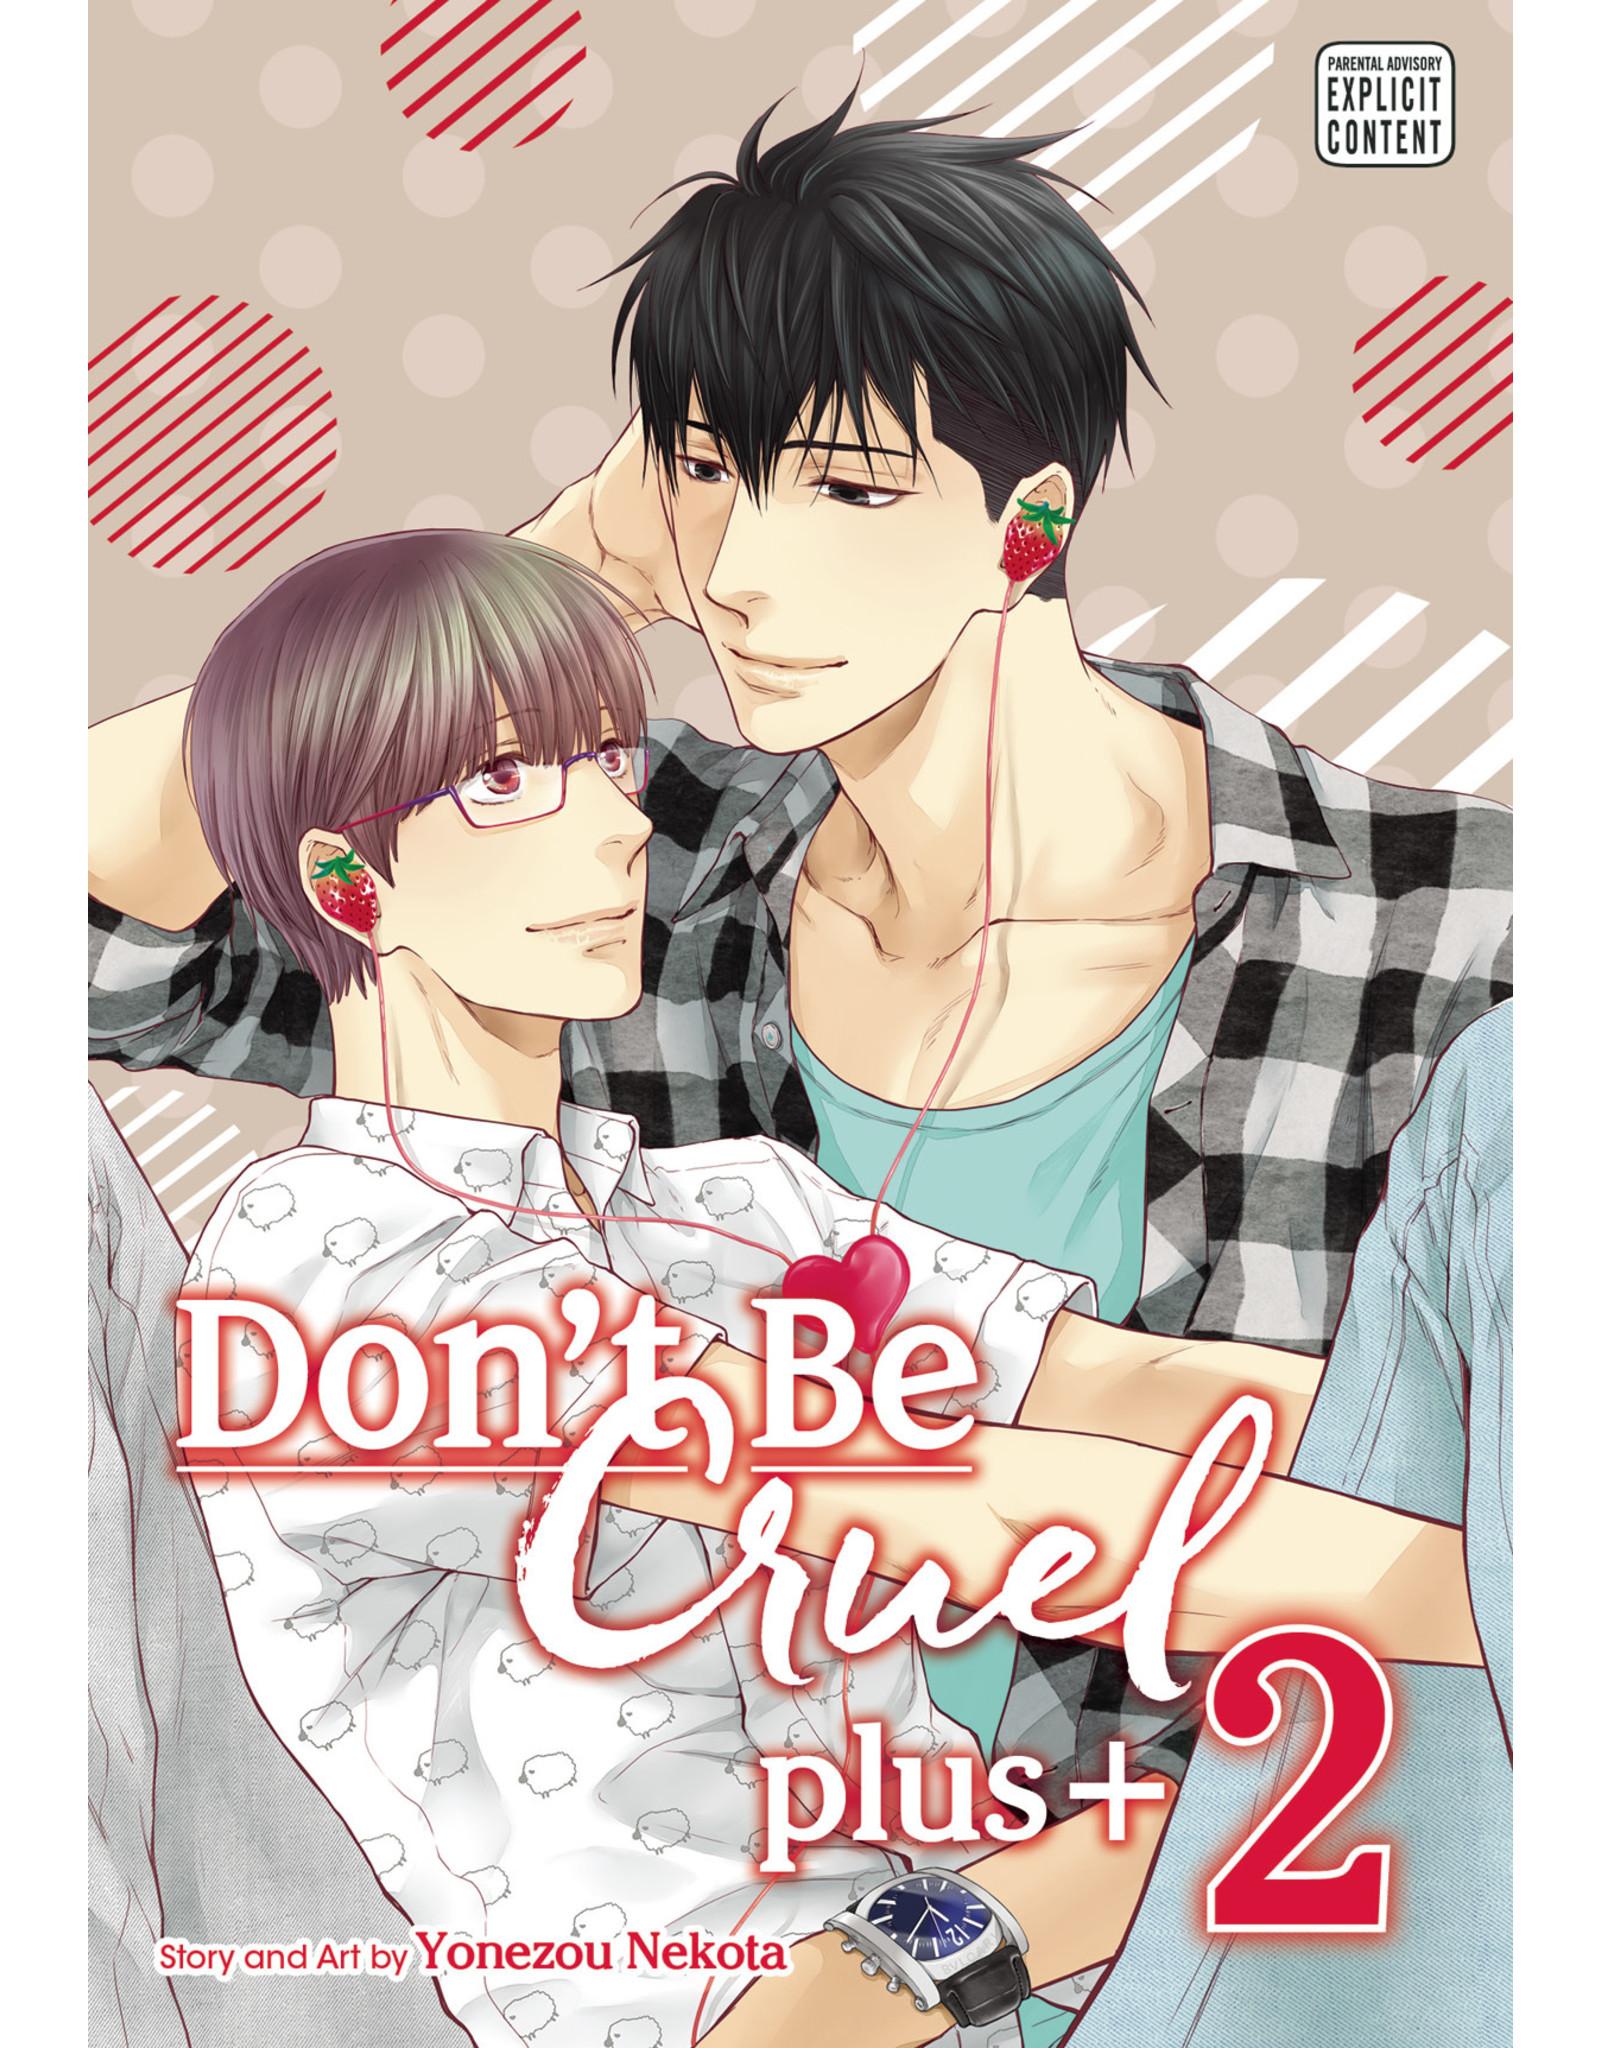 Don't Be Cruel plus+ 2 (English) - Manga